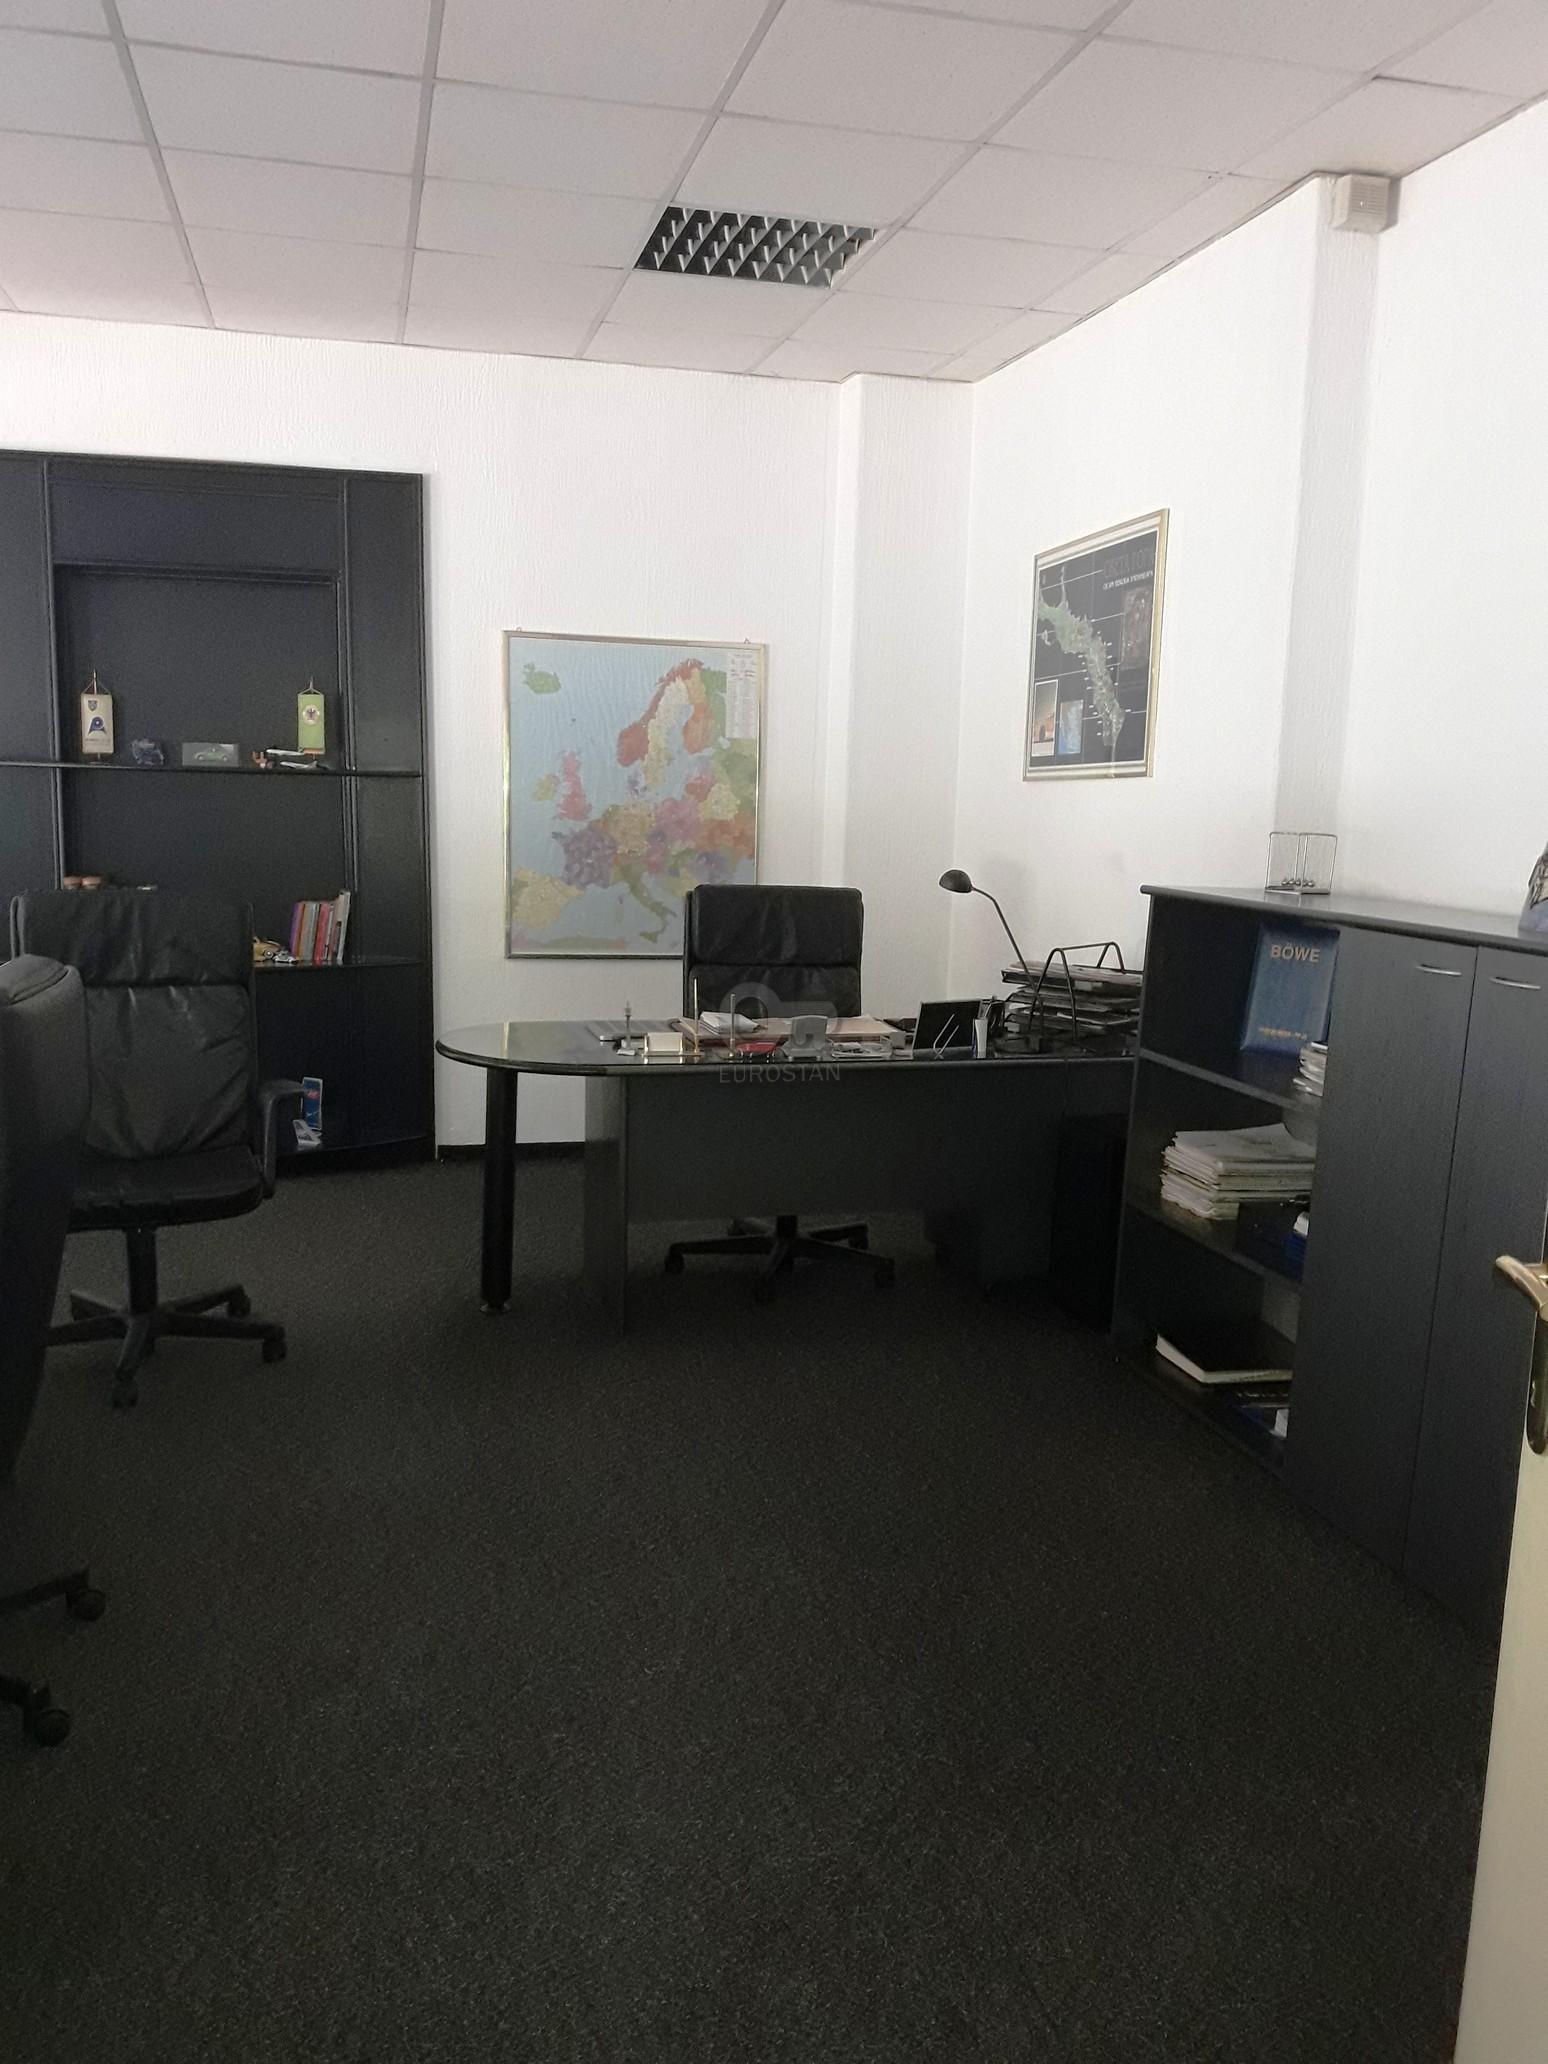 Poslovni prostor BLOK 30 B92 200000 EUR